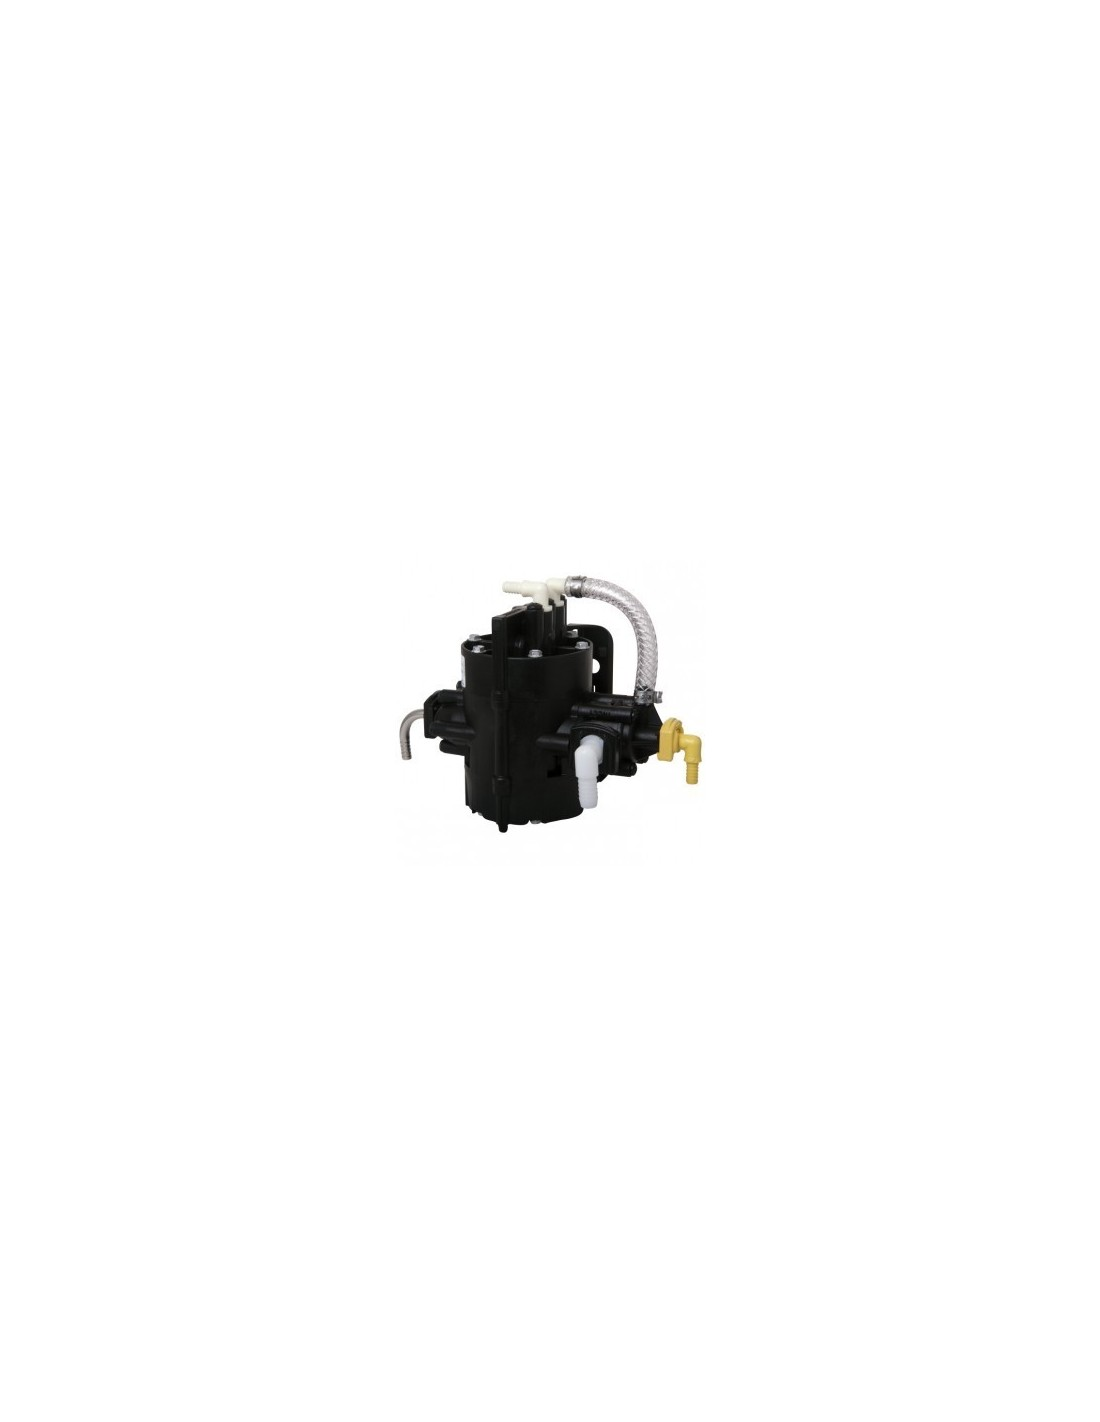 PUC02041 - Shurflo pneumatic wine pump